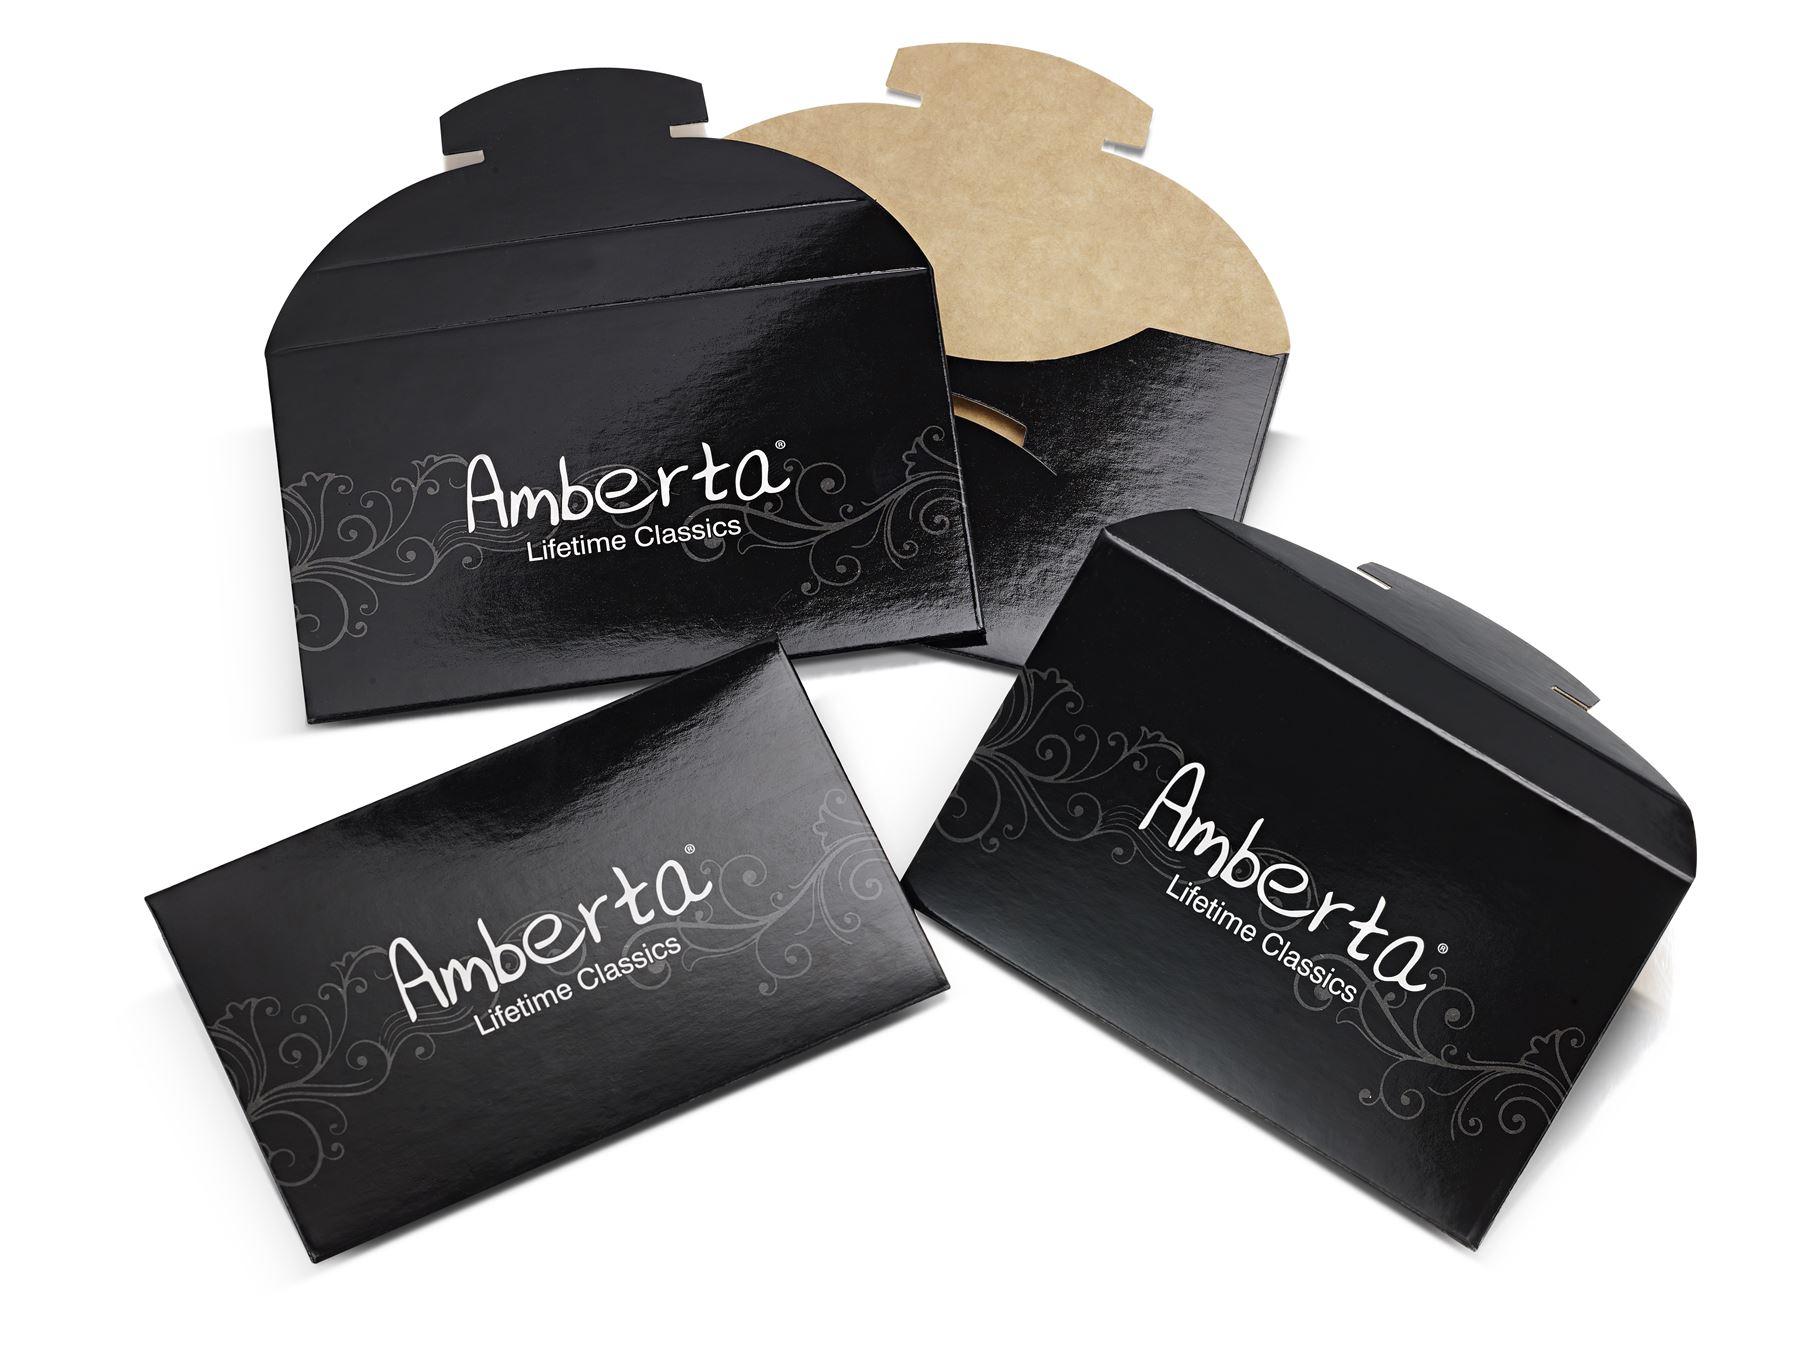 Amberta-Jewelry-925-Sterling-Silver-Adjustable-Bracelet-Italian-Bangle-for-Women thumbnail 22